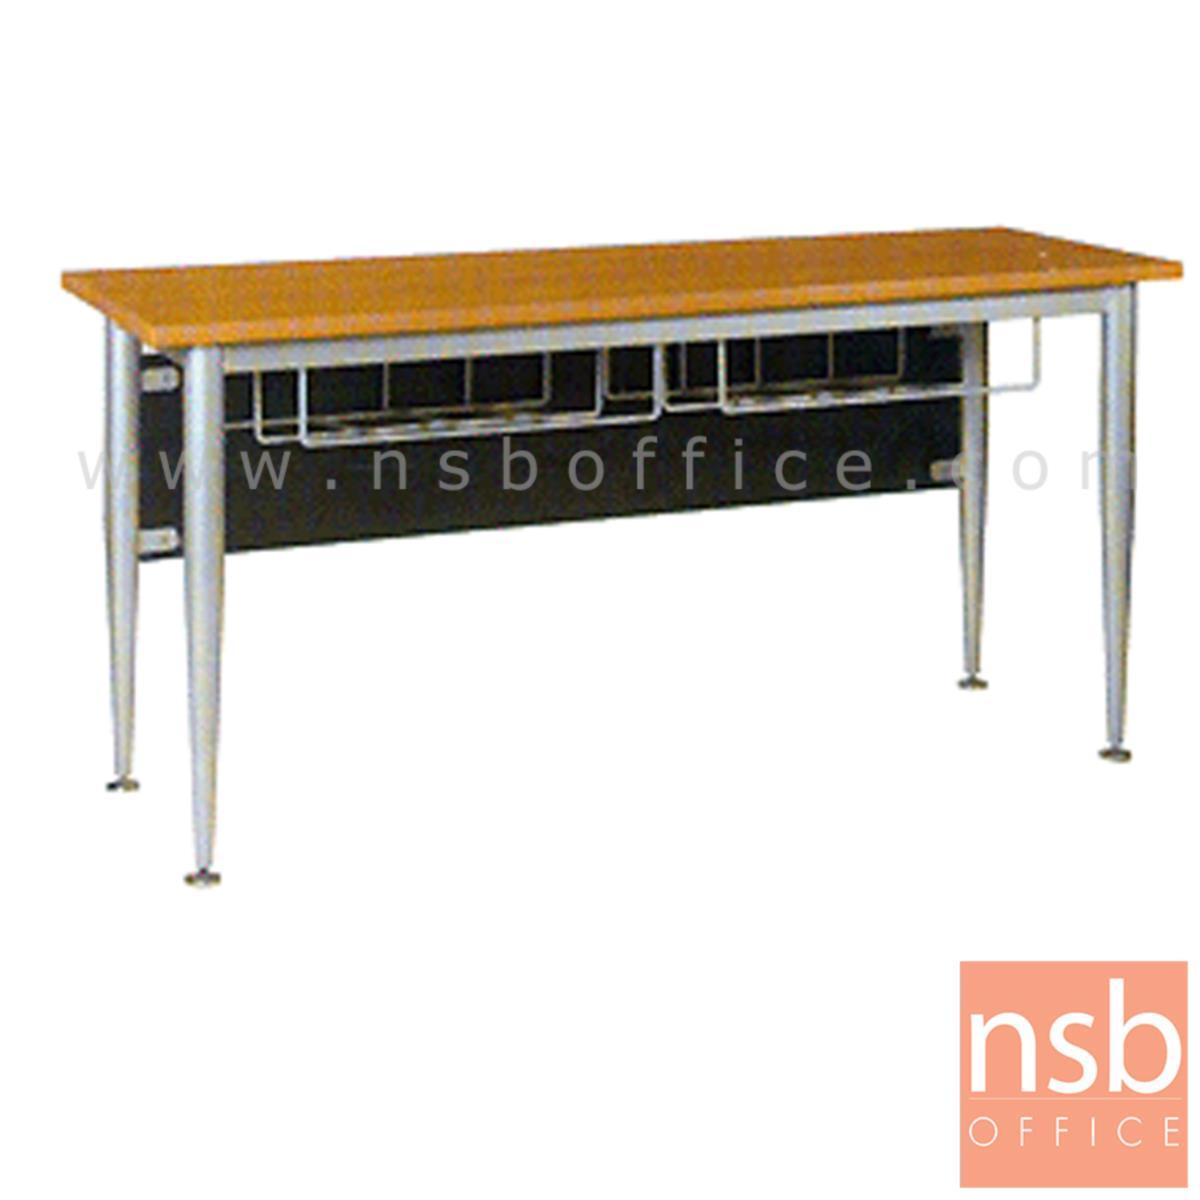 A07A043:โต๊ะทำงาน มีตะแกรงใต้โต๊ะ รุ่น Nomos (โนมอส) ขนาด 120W ,150W ,180W cm.  ขาเหล็กพ่นบอร์นเงิน